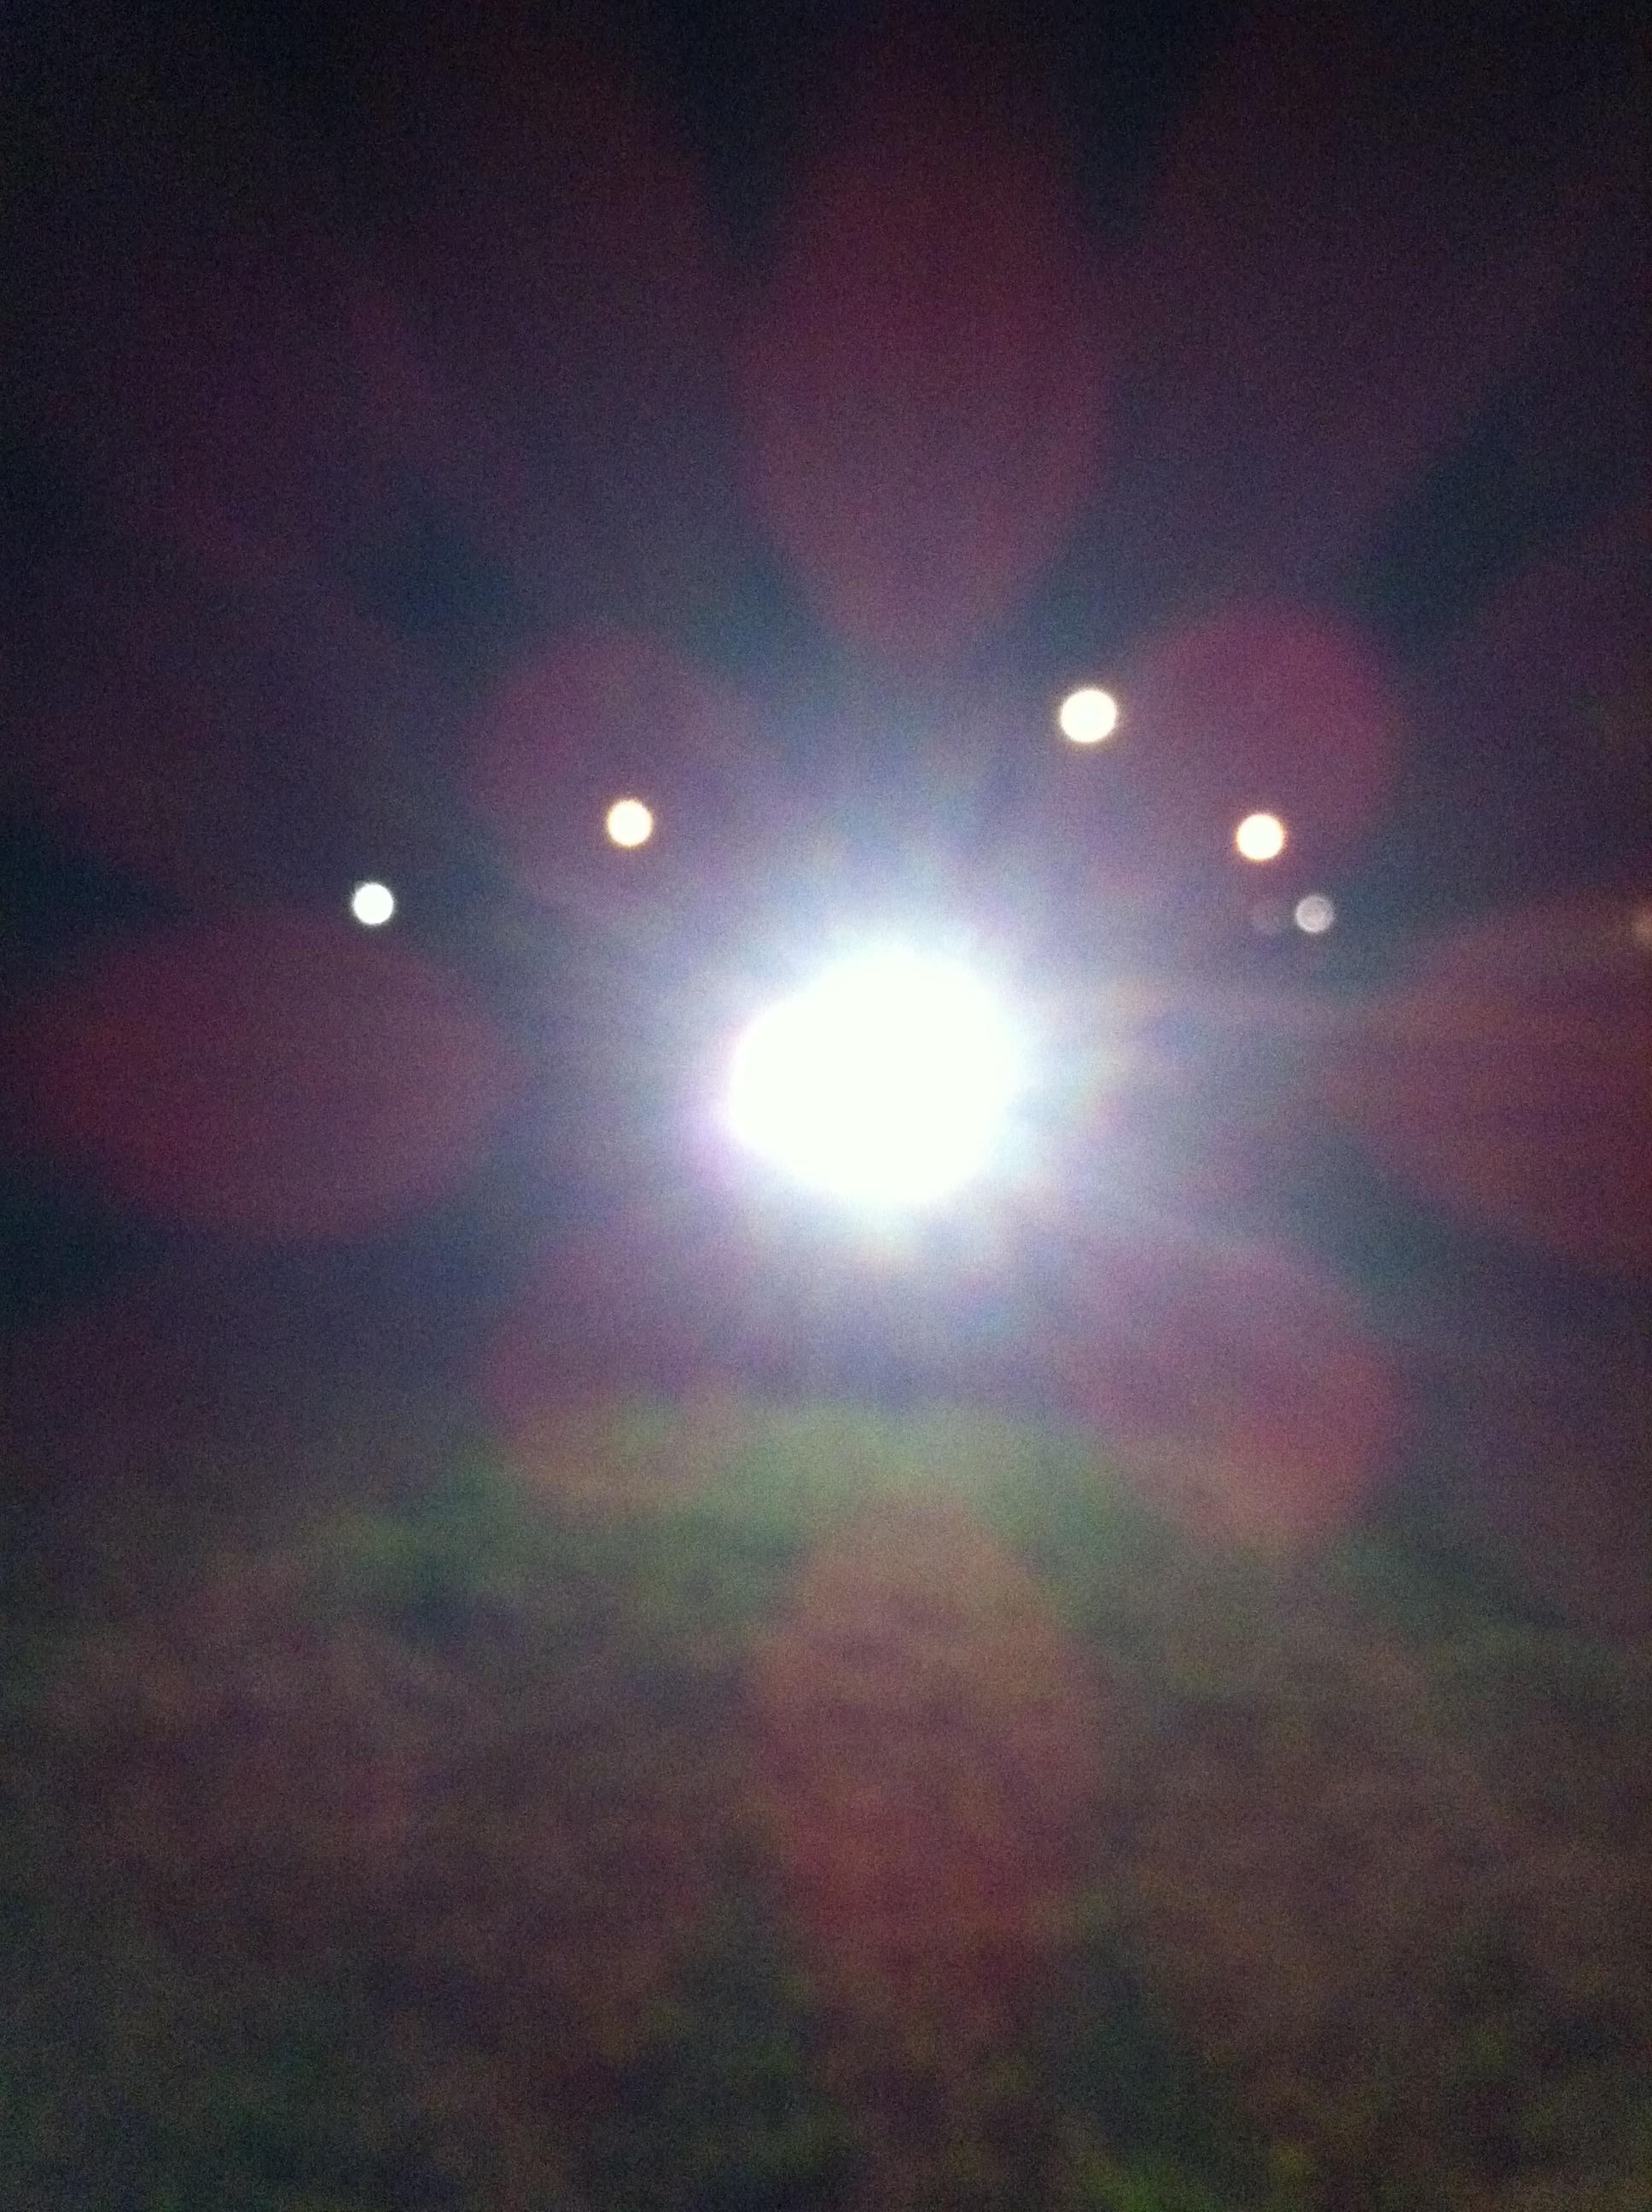 Motorcycle and Vehicle Lighting